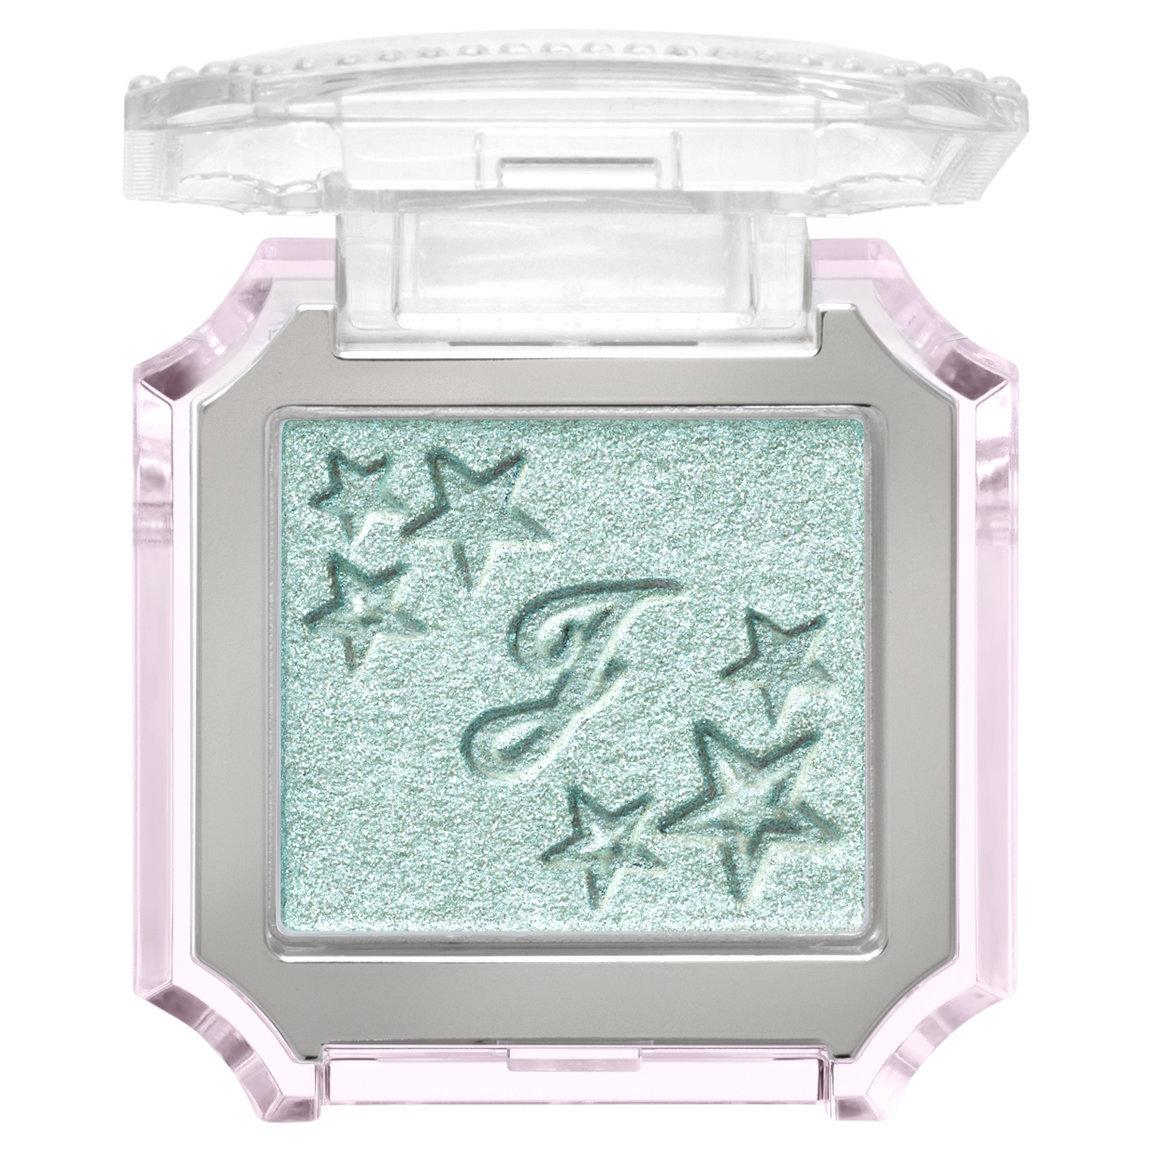 JILL STUART Beauty Dreamy Shimmer Eyeshadow 01 Poison Candy alternative view 1 - product swatch.